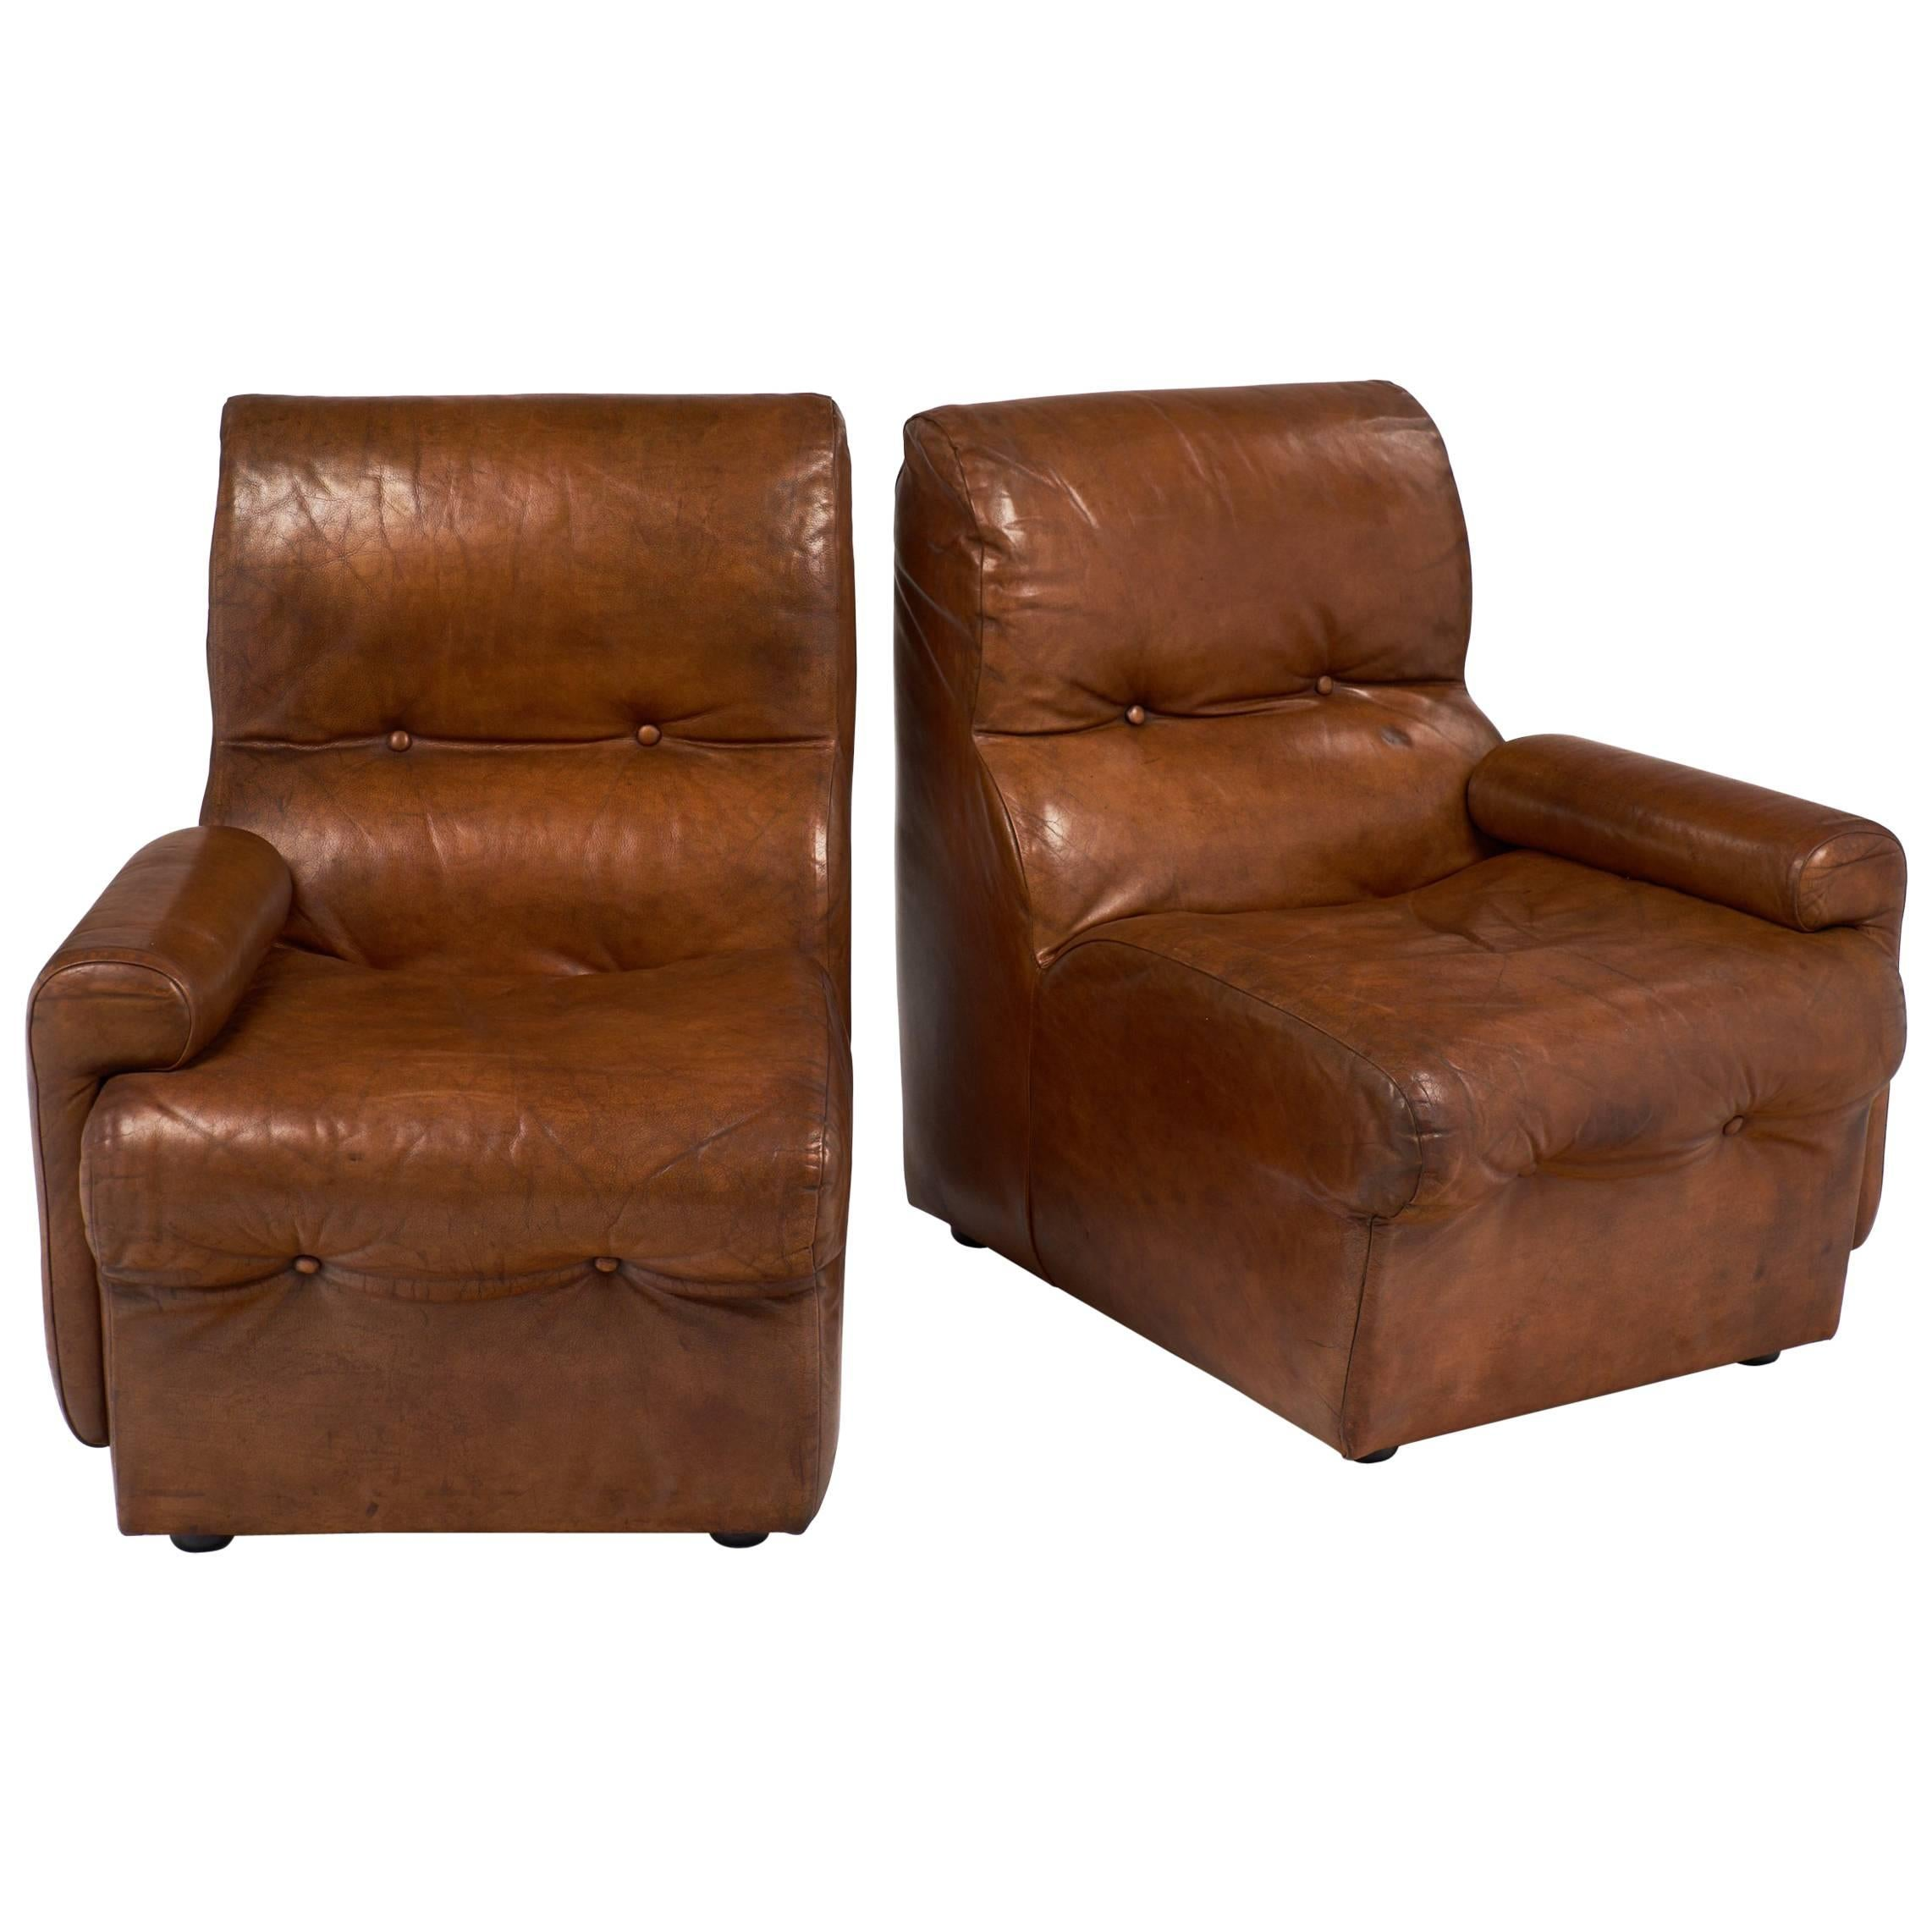 Vintage Mid-Century Cognac Leather Armchairs